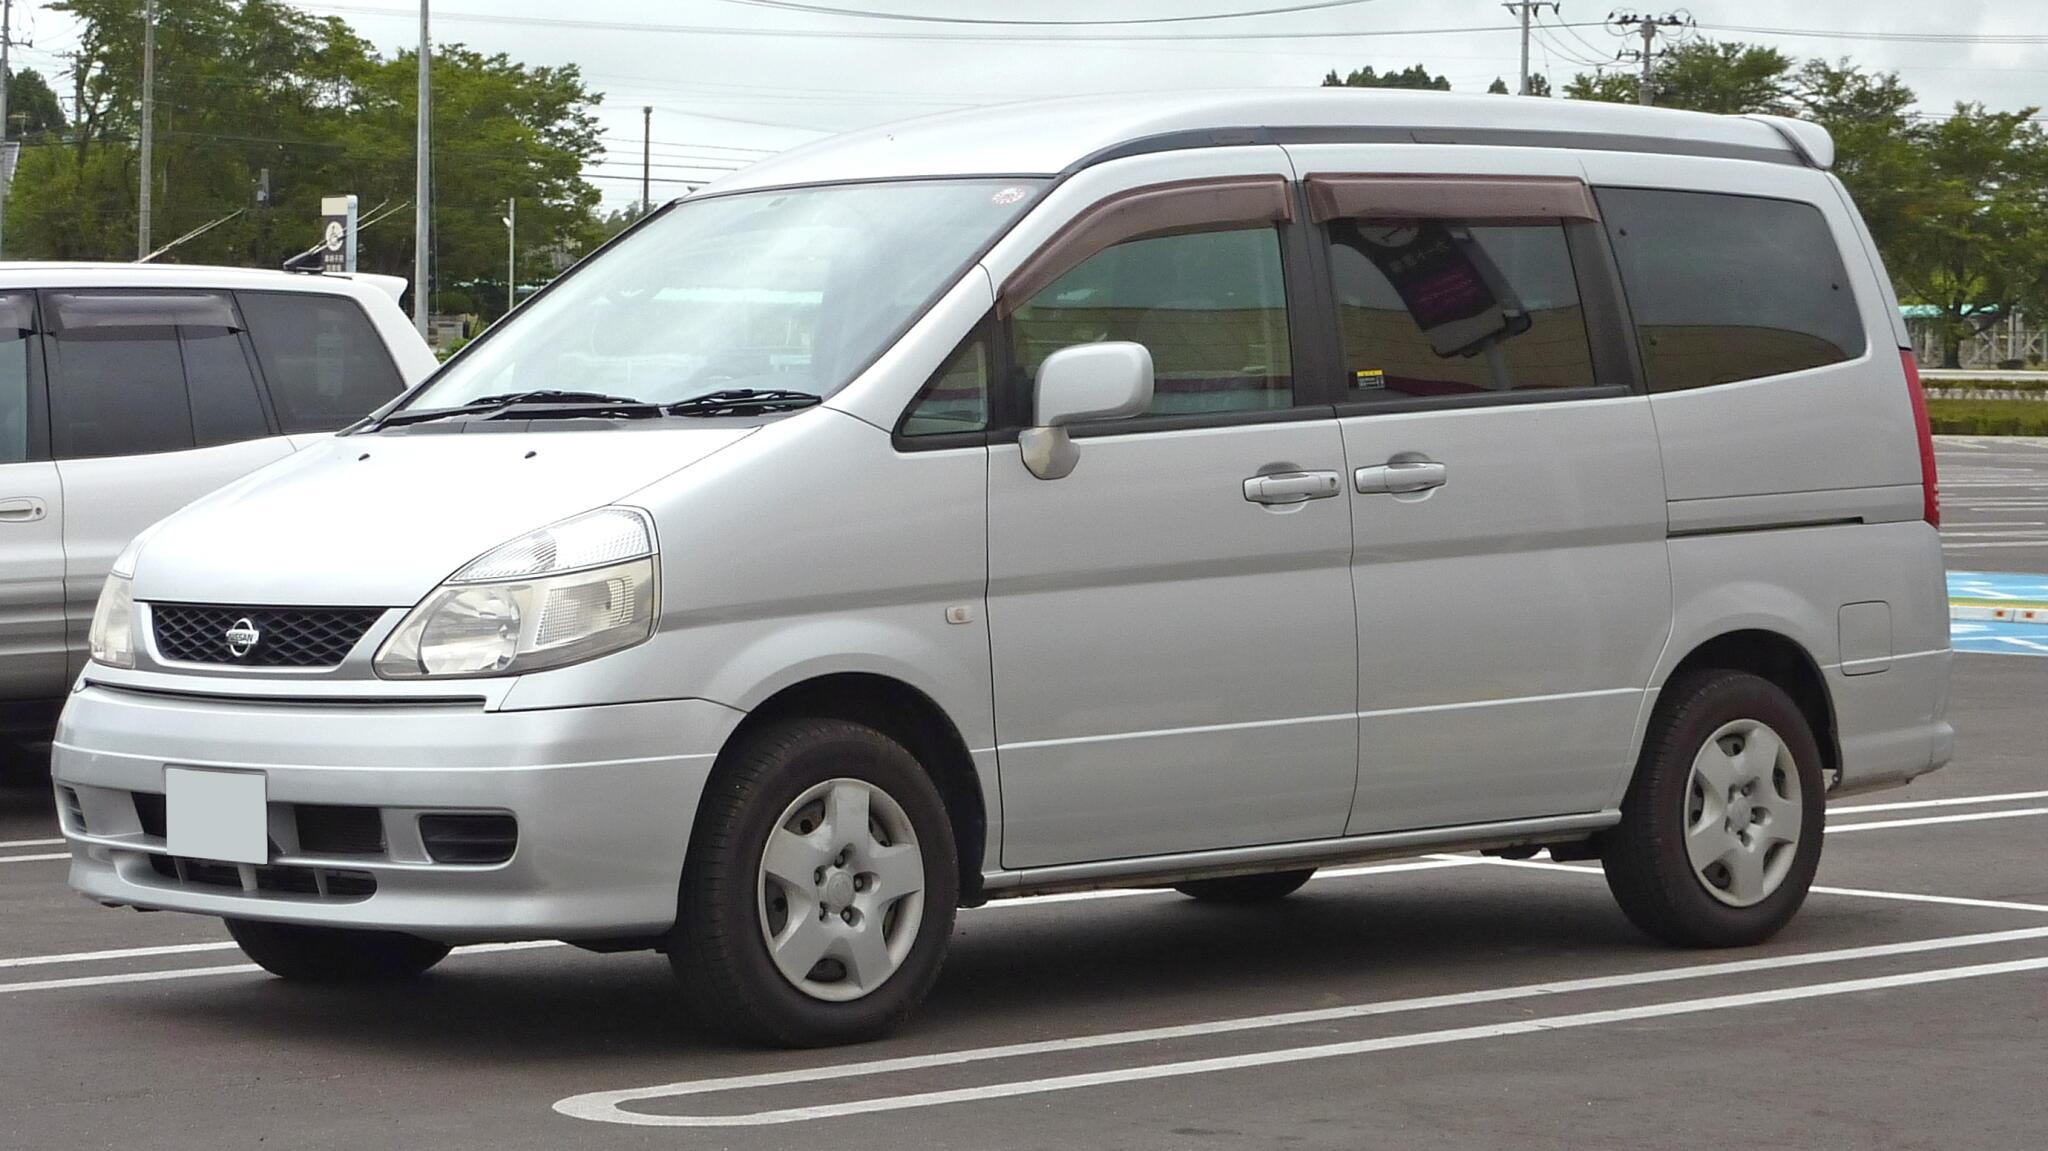 File C24 Nissan Serena Jpg Wikimedia Commons